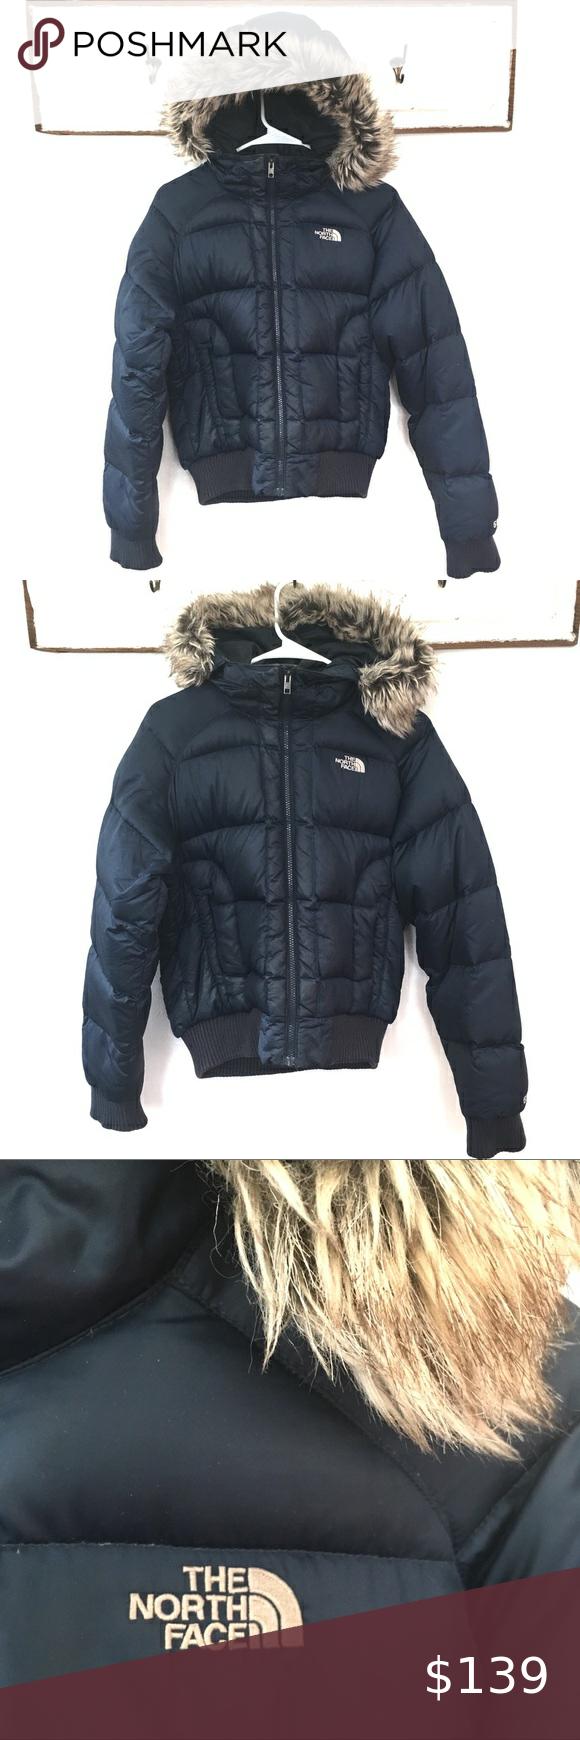 The North Face 550 Puffer Goose Down Coat Fur Hood North Face Jacket Womens North Face Womens Coat White North Face Coat [ 1740 x 580 Pixel ]